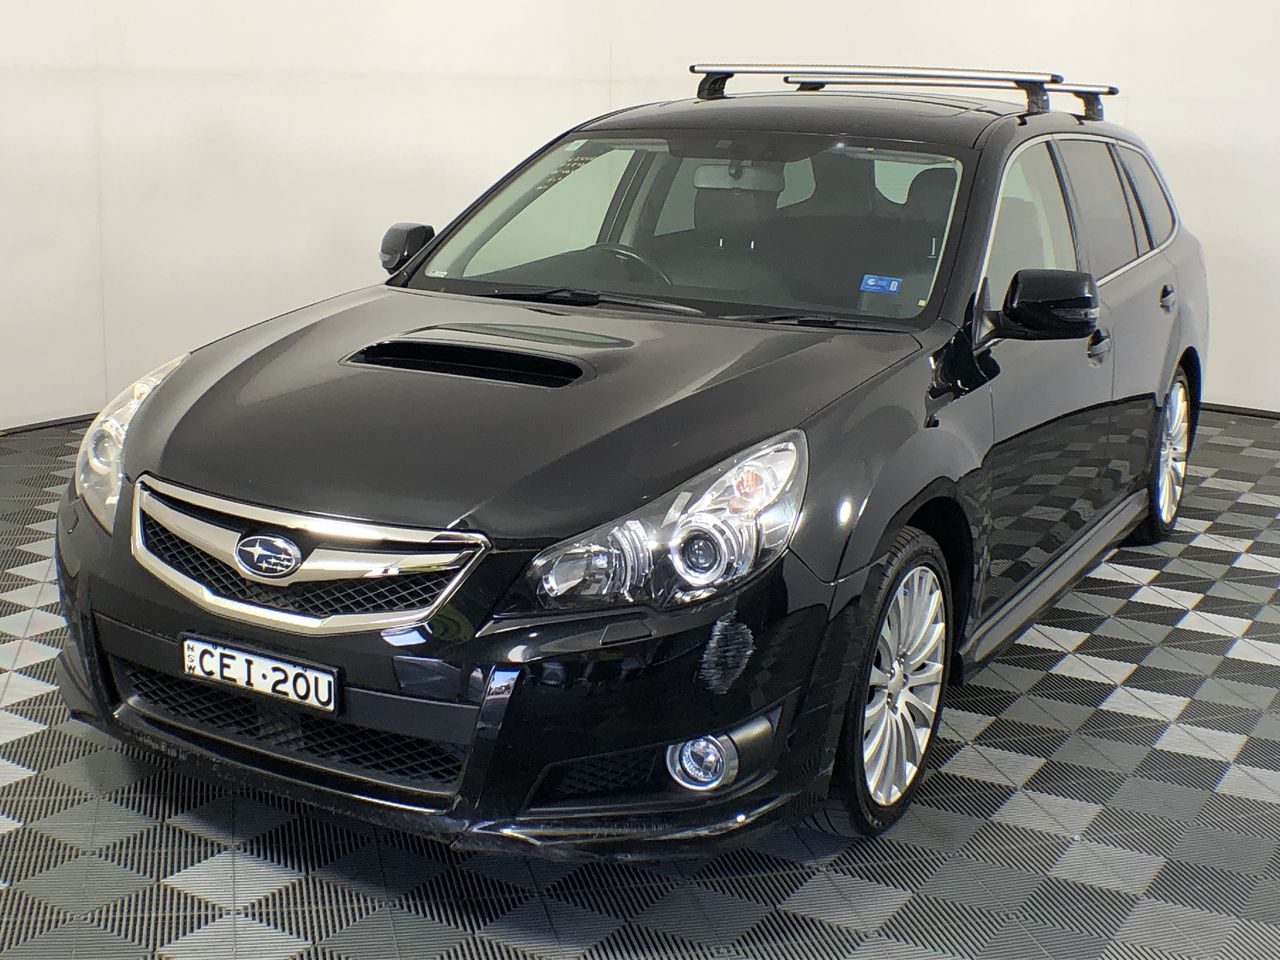 2011 Subaru Liberty 2.5i GT Premium B5 Automatic Wagon